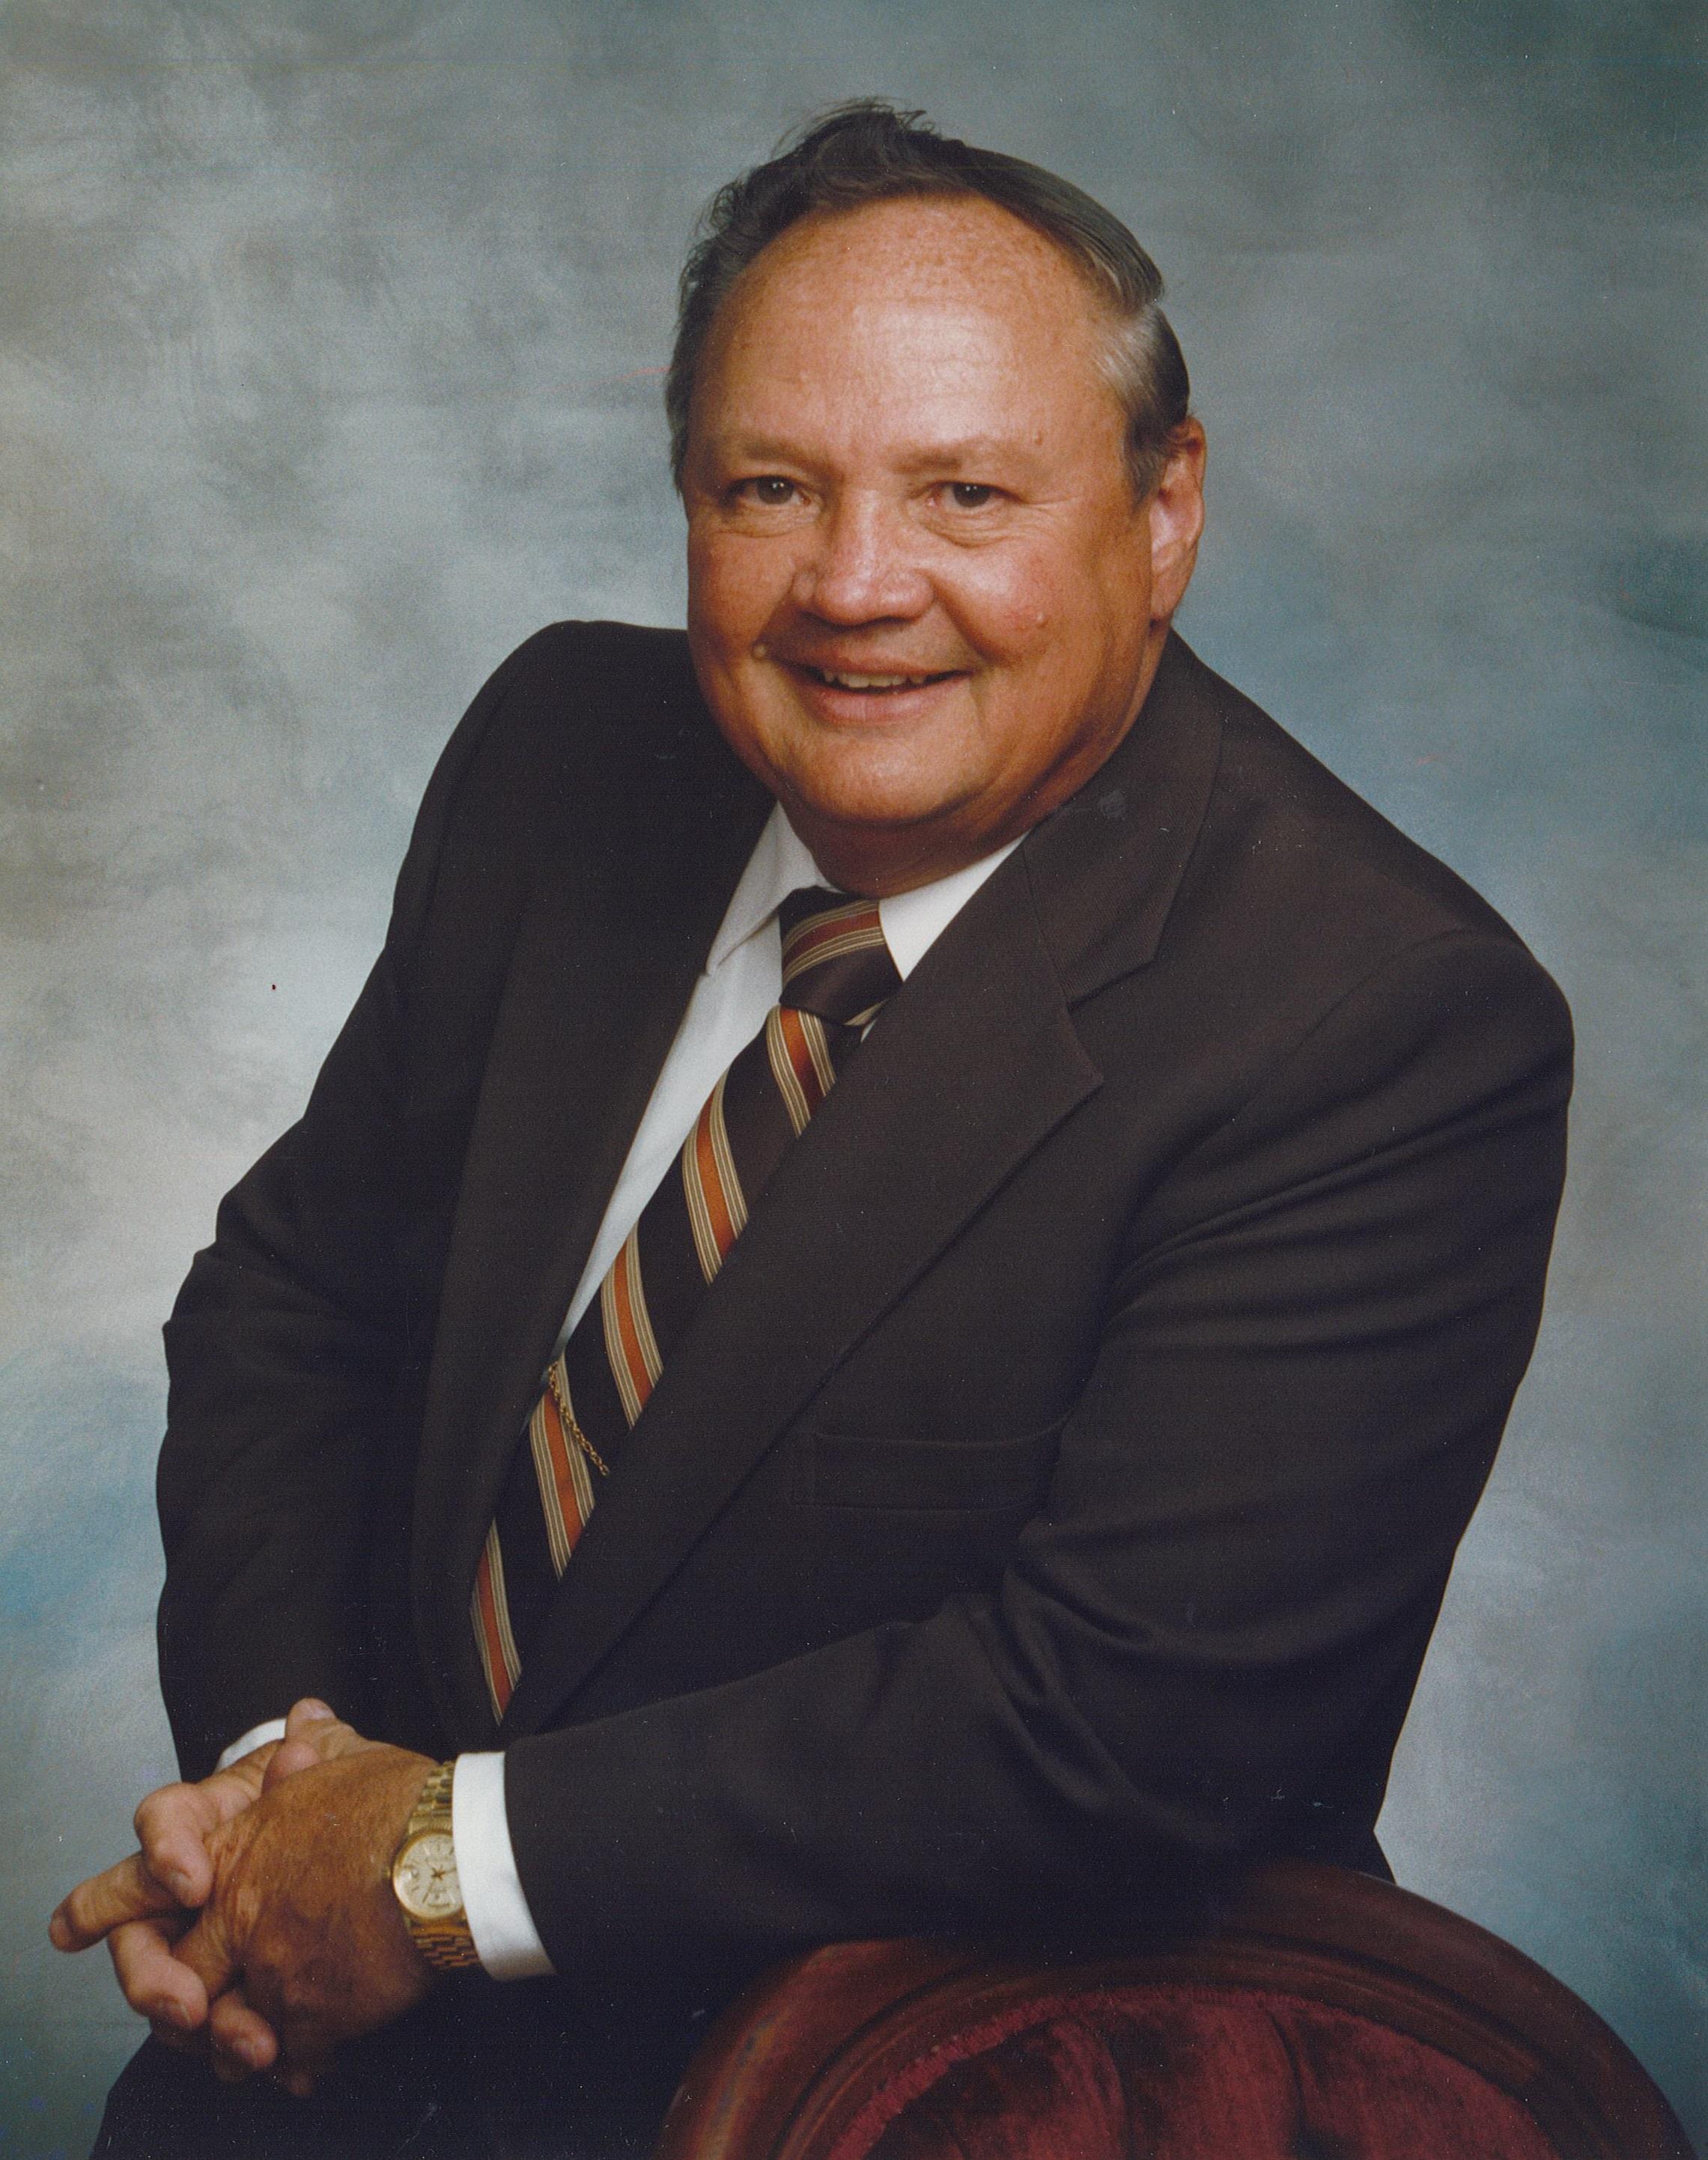 Richard E. Paules, CLU